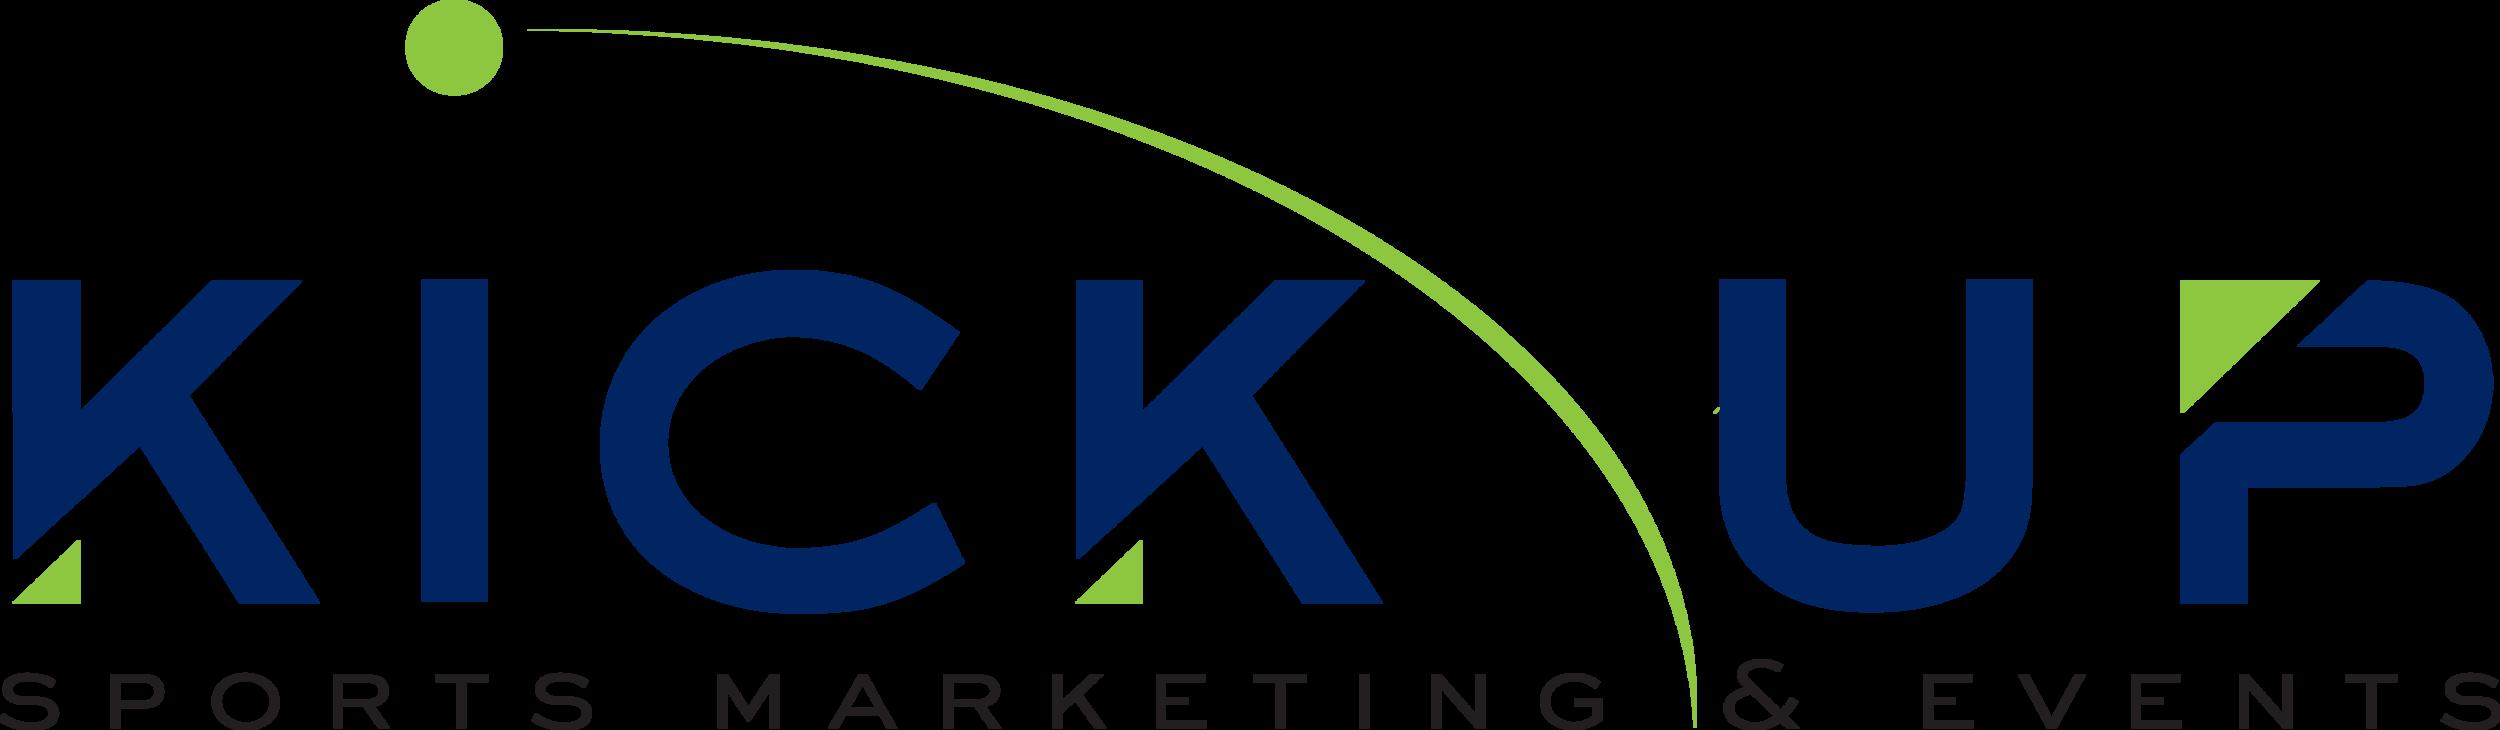 Logo Kick Up complet.png